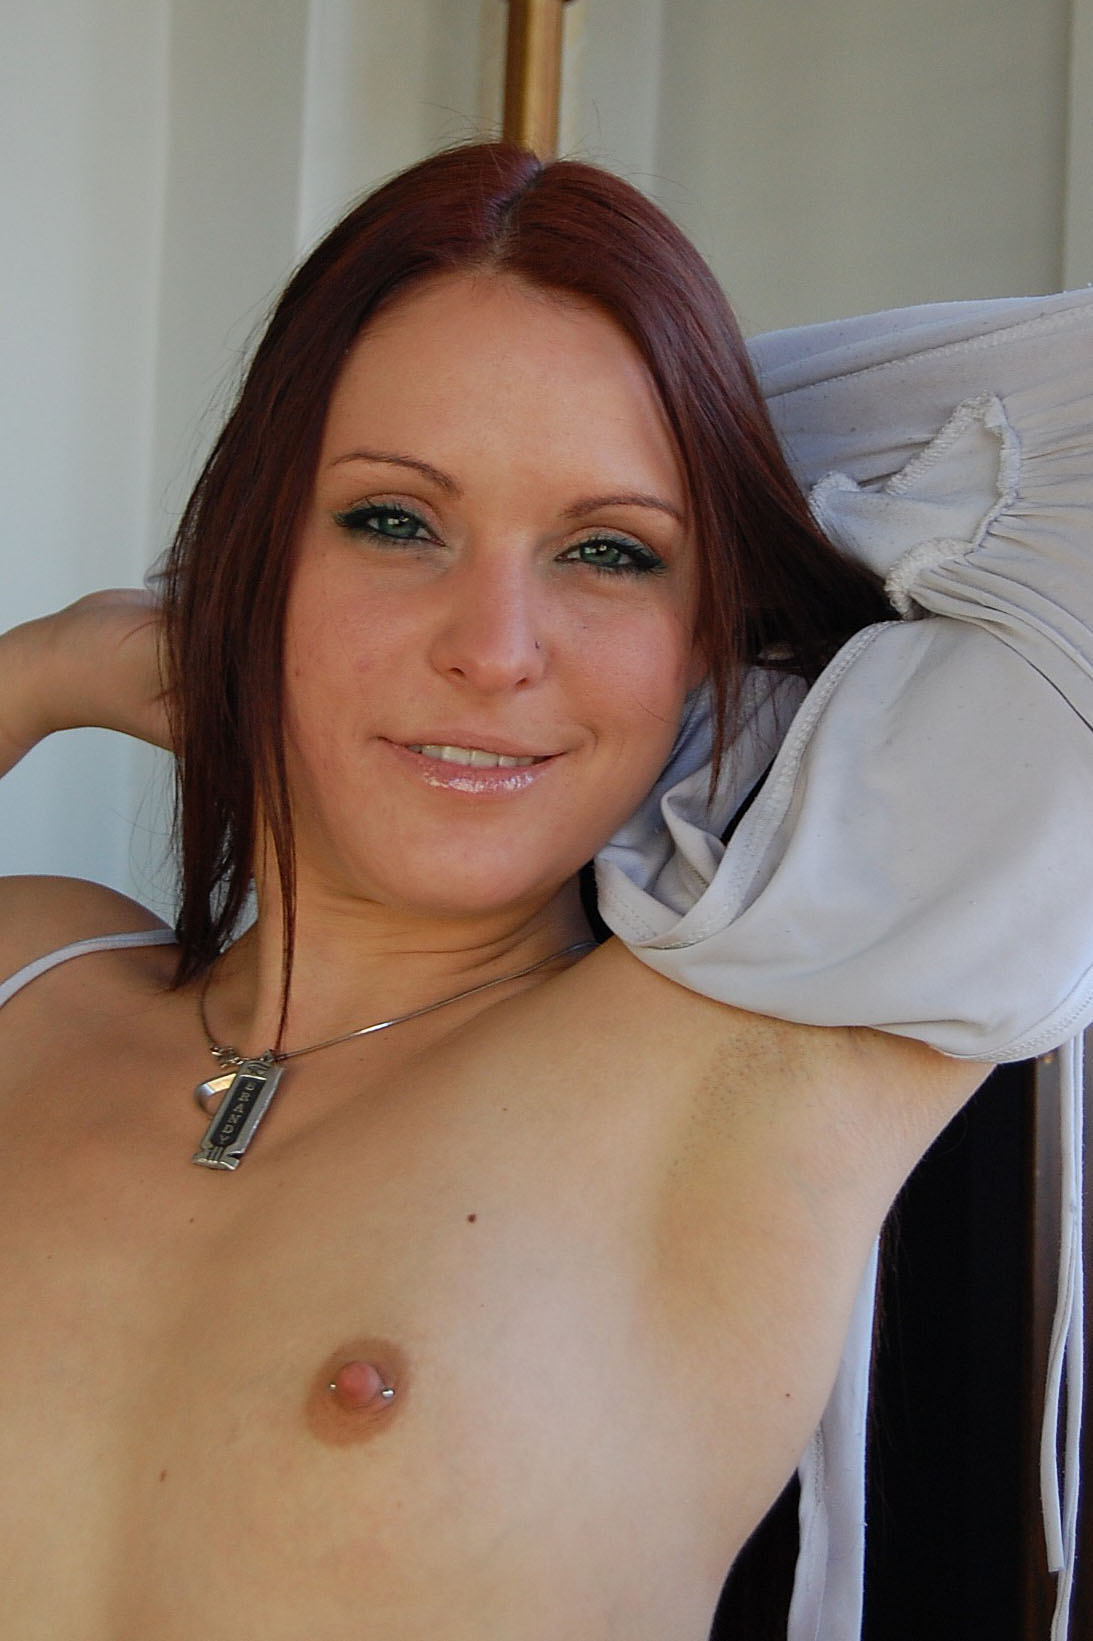 Amateur Sex Model Ameara LeVay